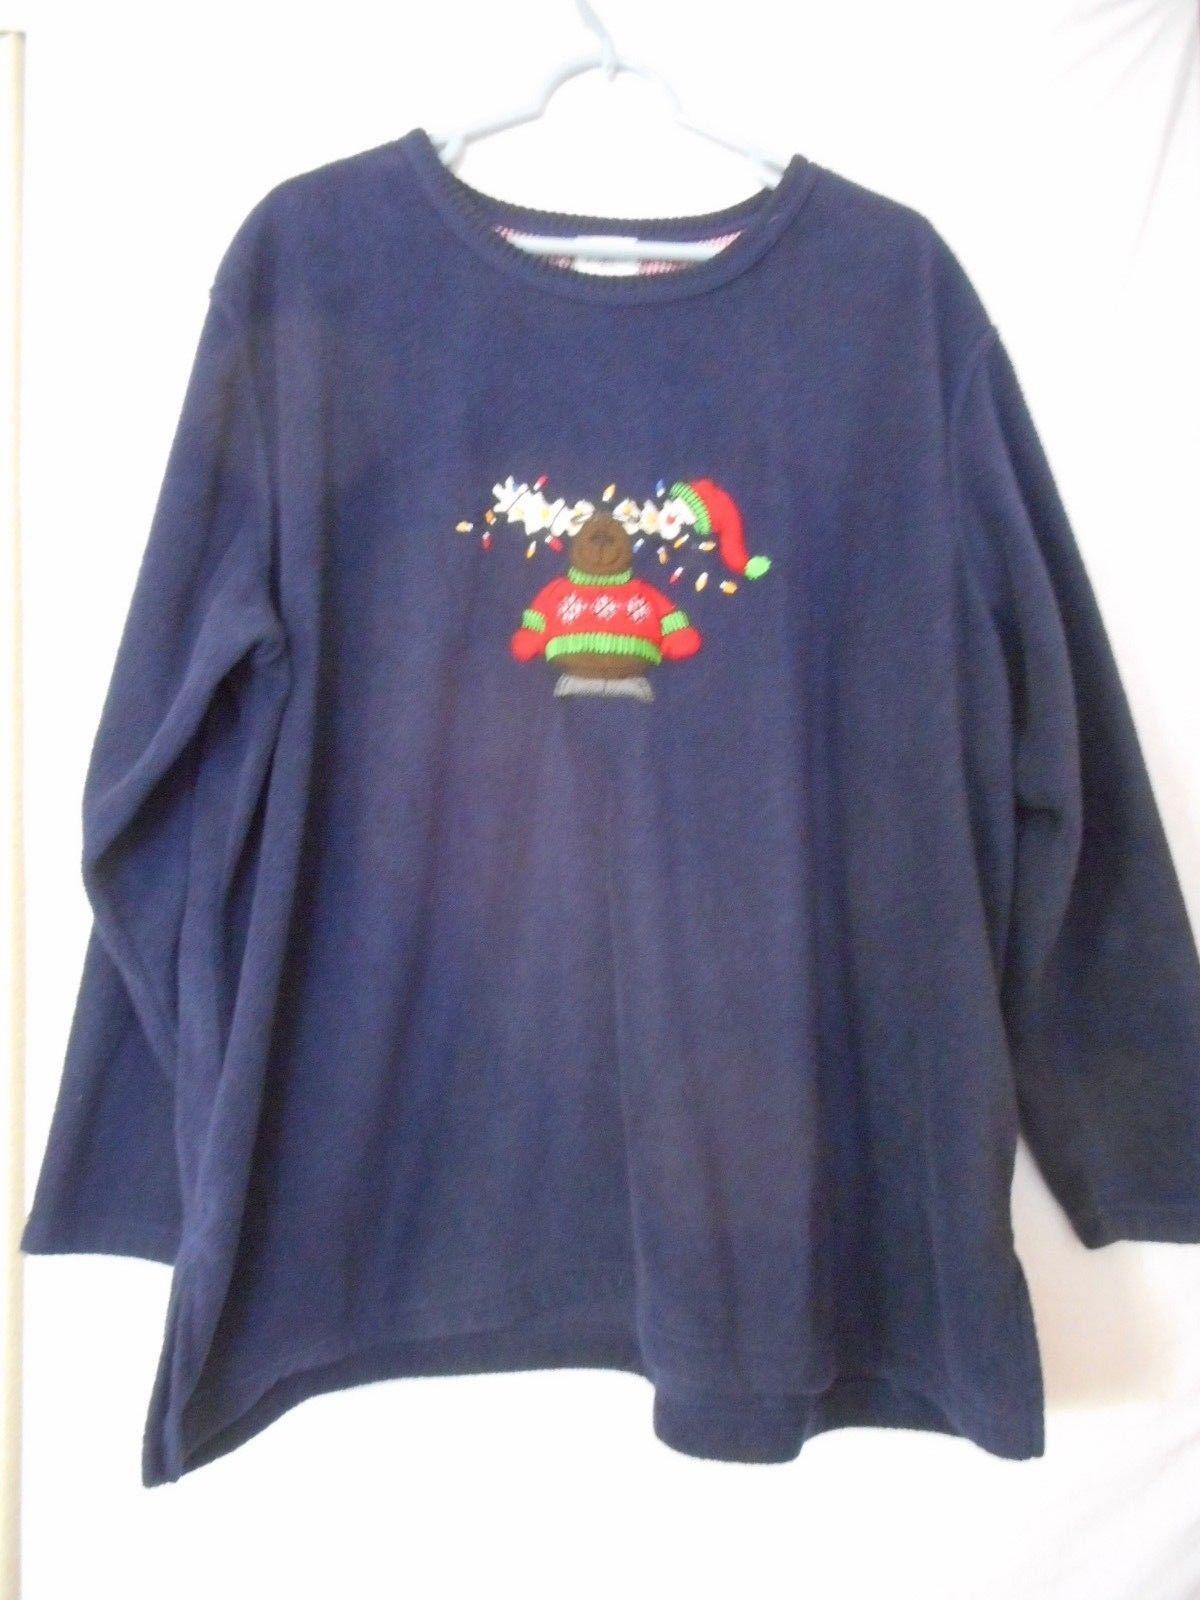 Womens Size 2x  Blue fleece moose Christmas shirt